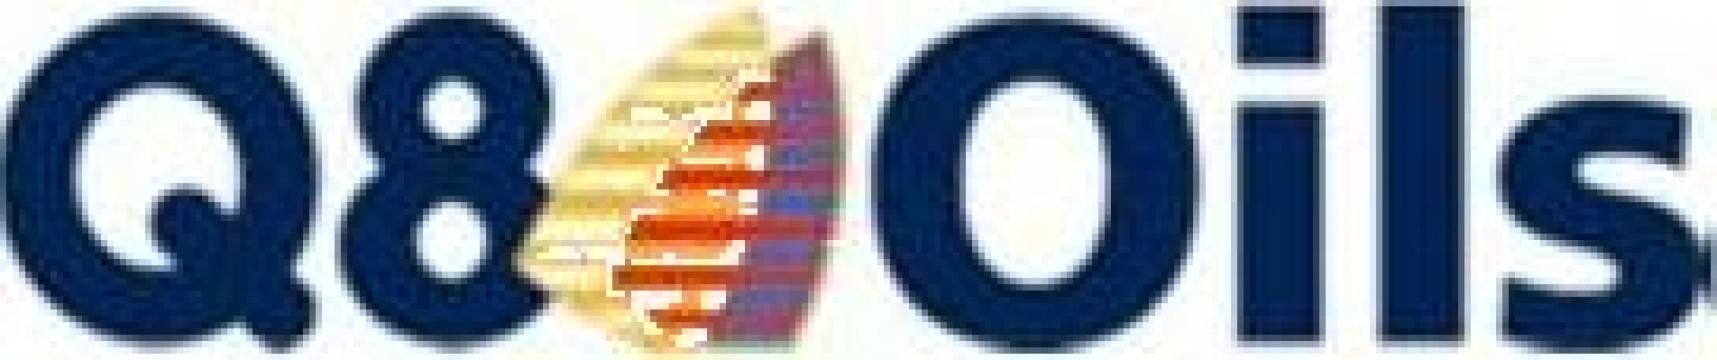 Ulei transmisie Q8 T1000D 10W30 de la Daniken Utilaje Srl